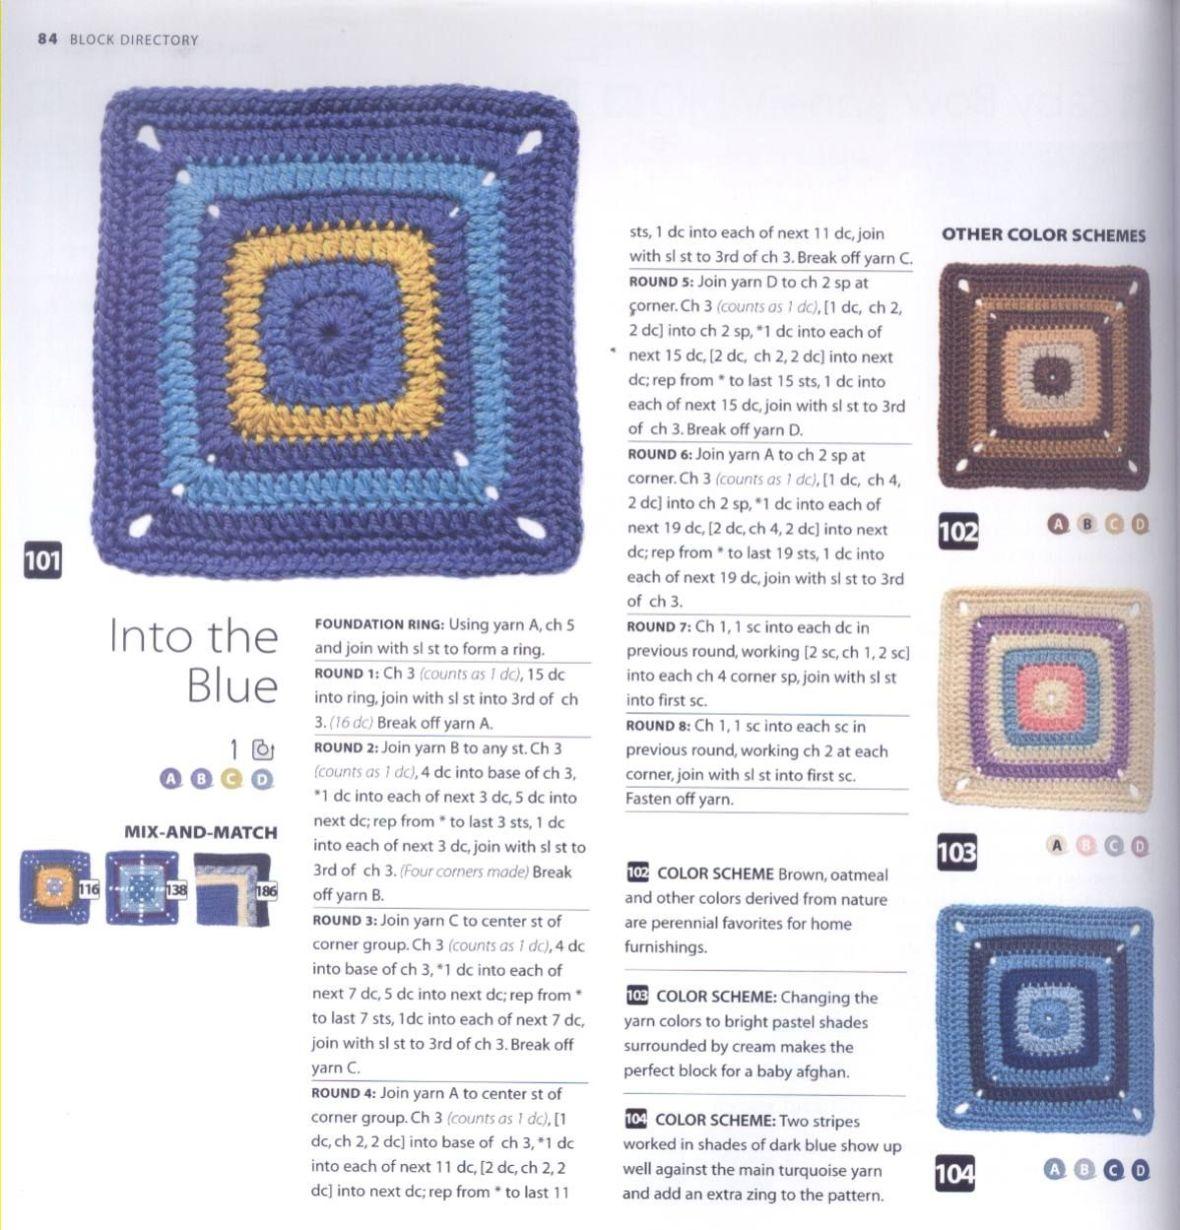 200 Crocheted Blocks for blankets, throws & Afghans 084